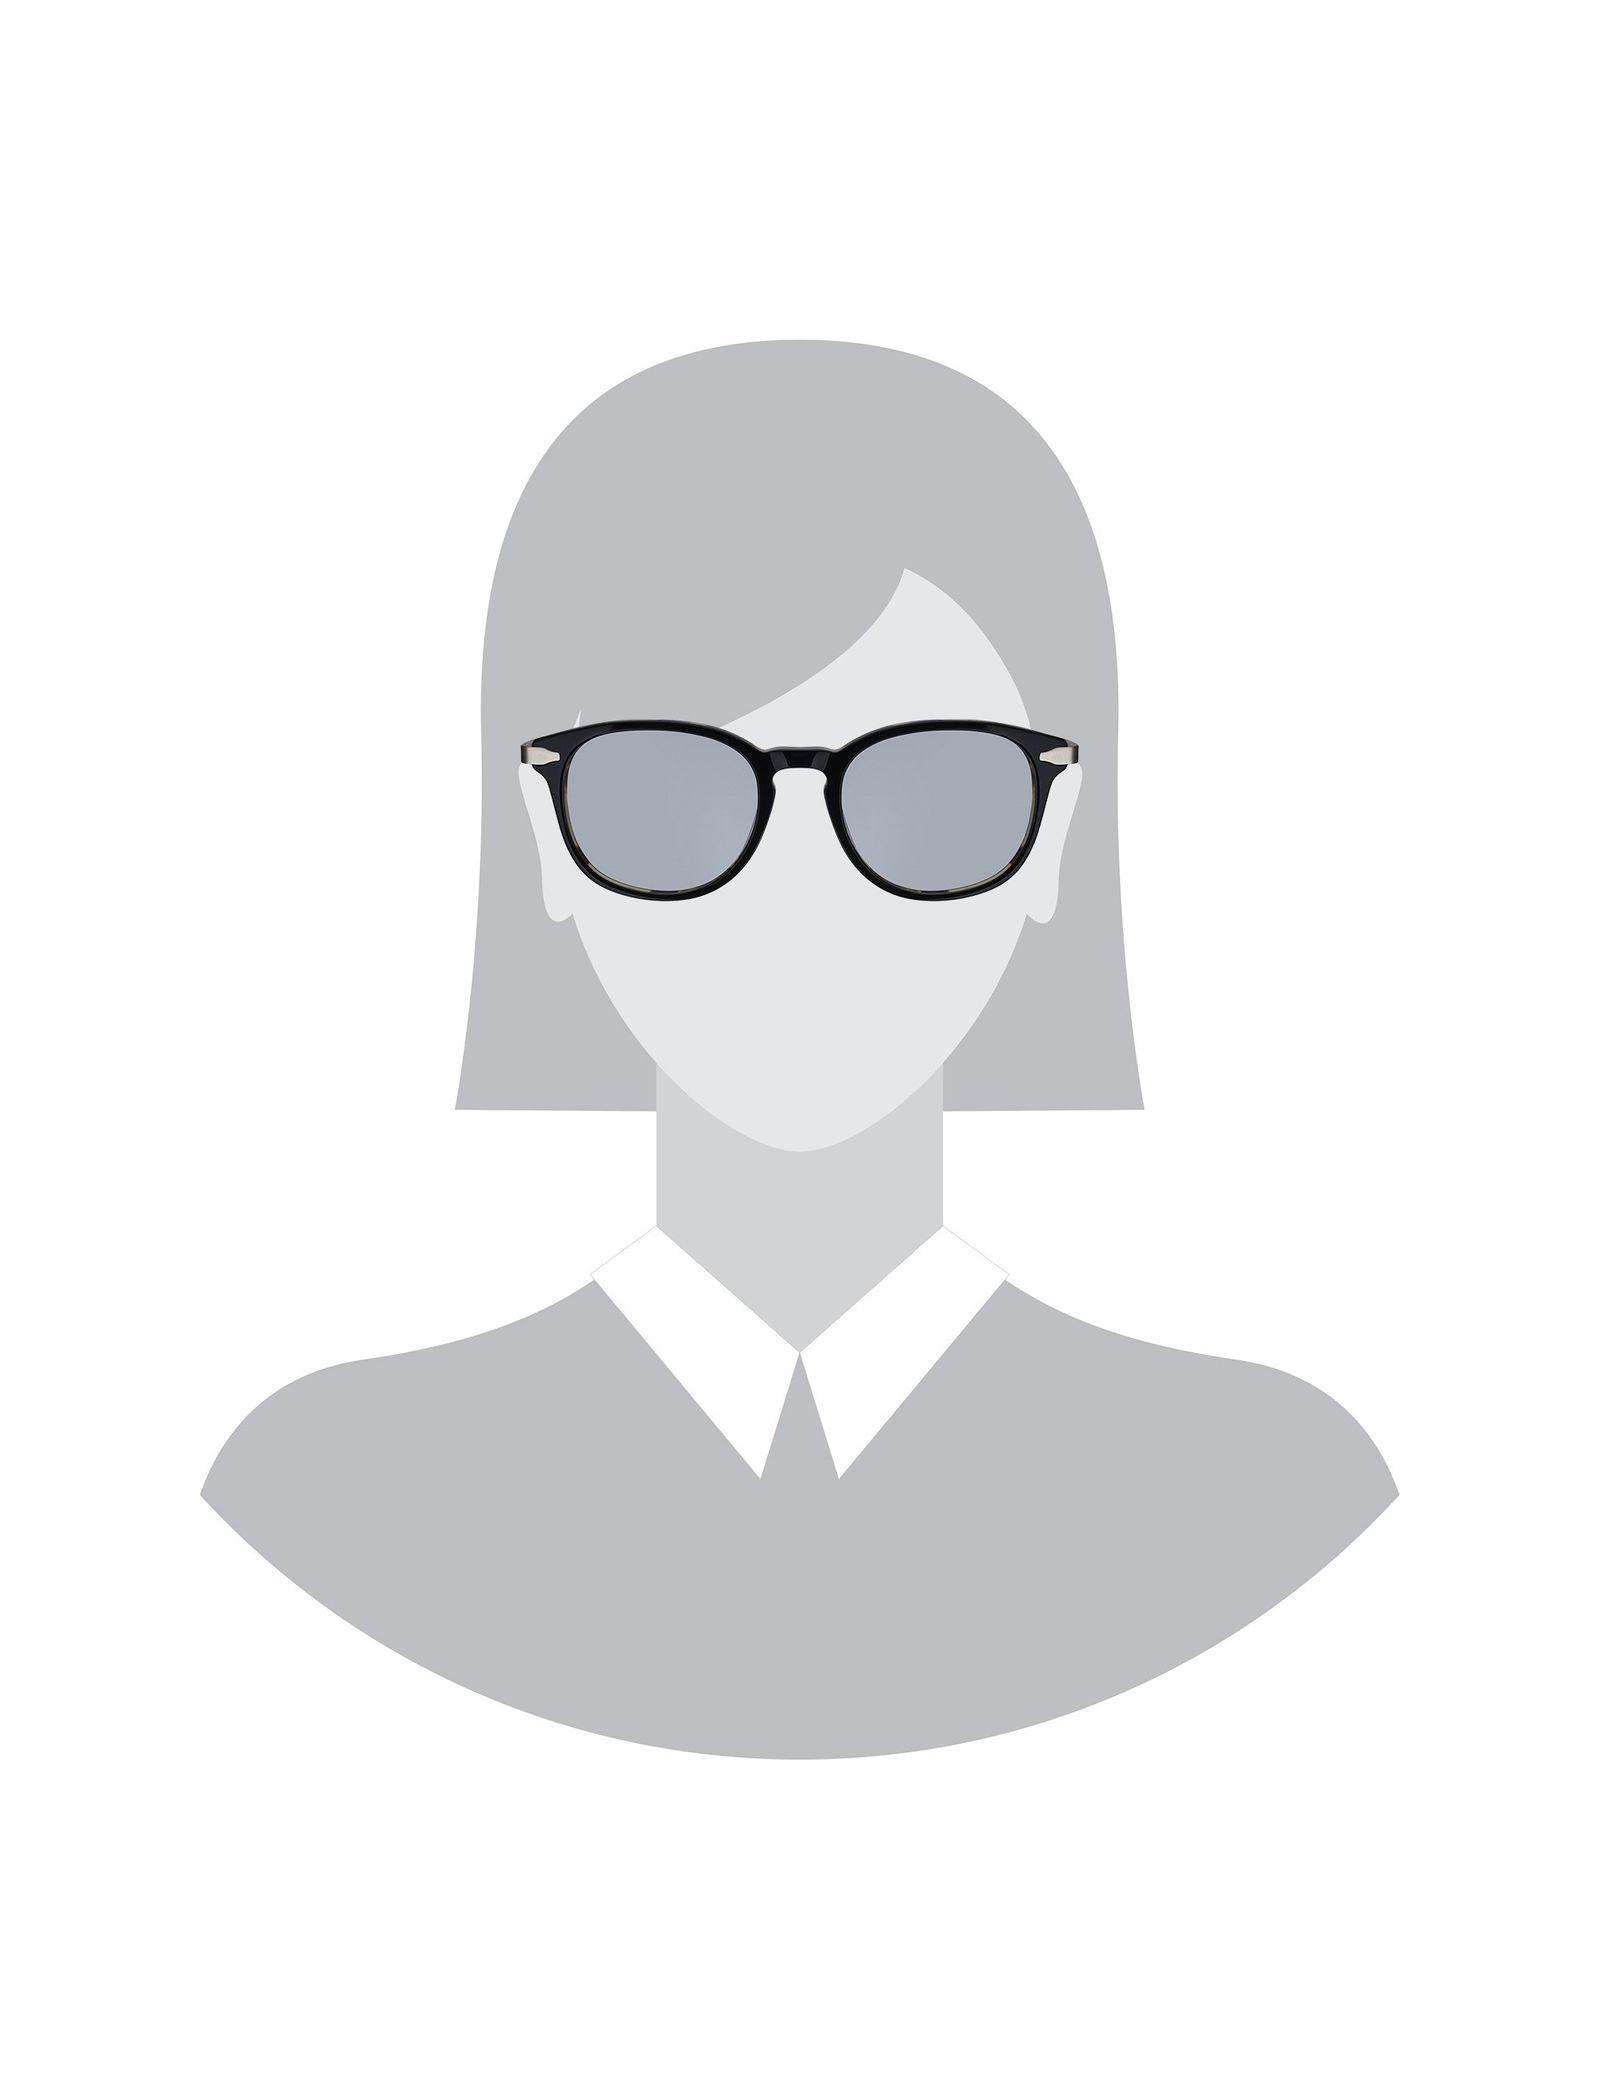 عینک طبی پنتوس مردانه - اسپاین - مشکي  - 5